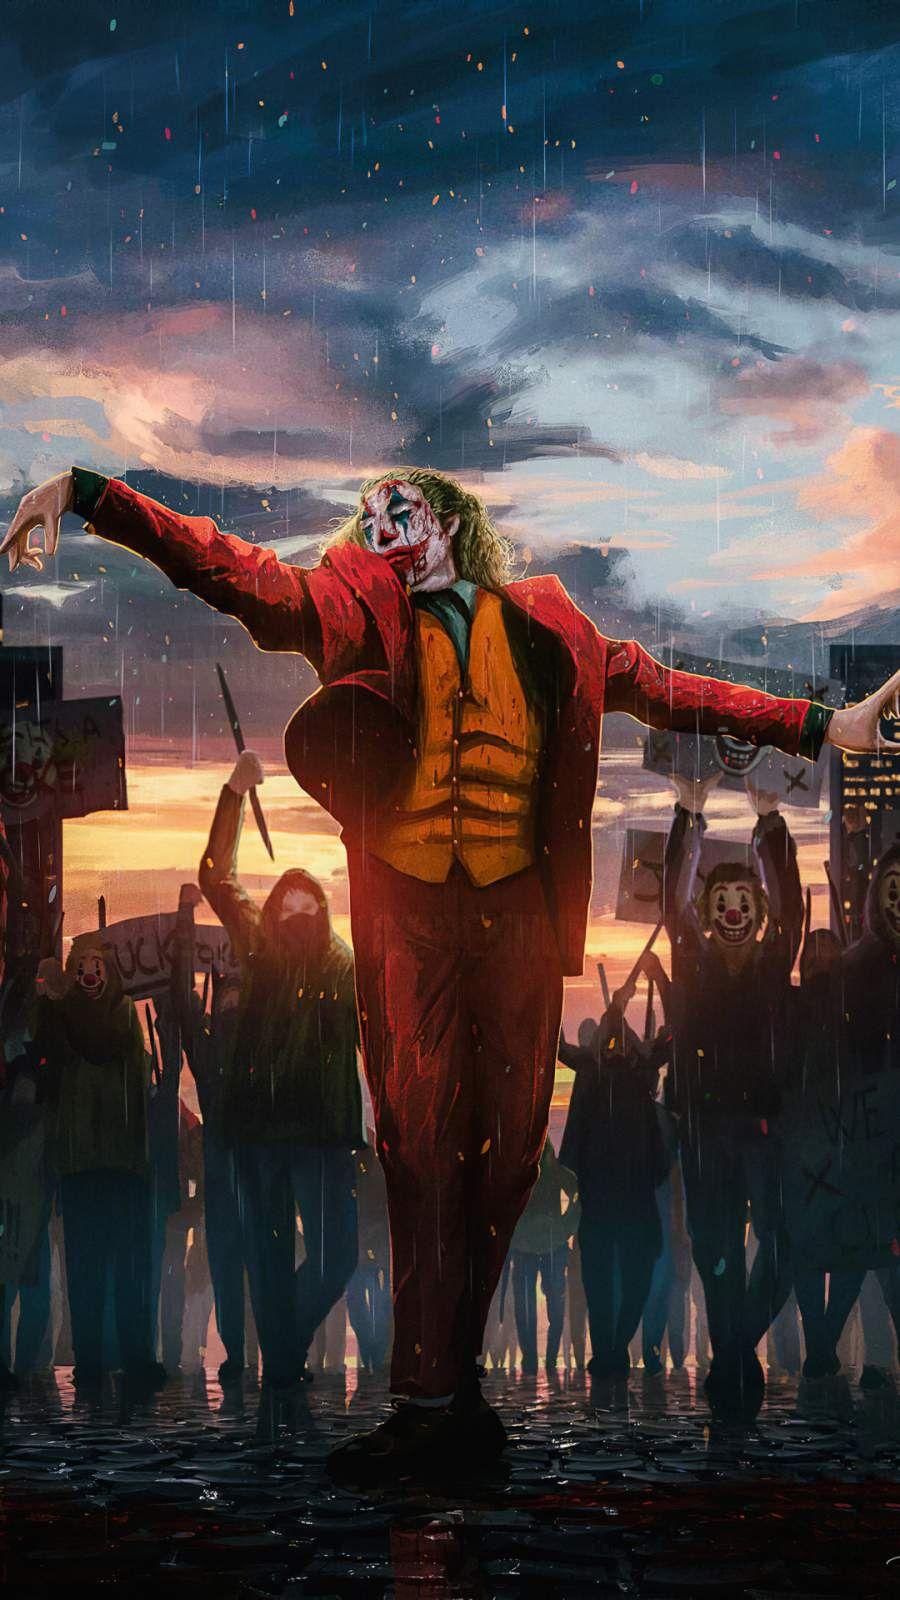 Joker Happy Clowns Iphone Wallpaper Arlequina E Coringa Desenho